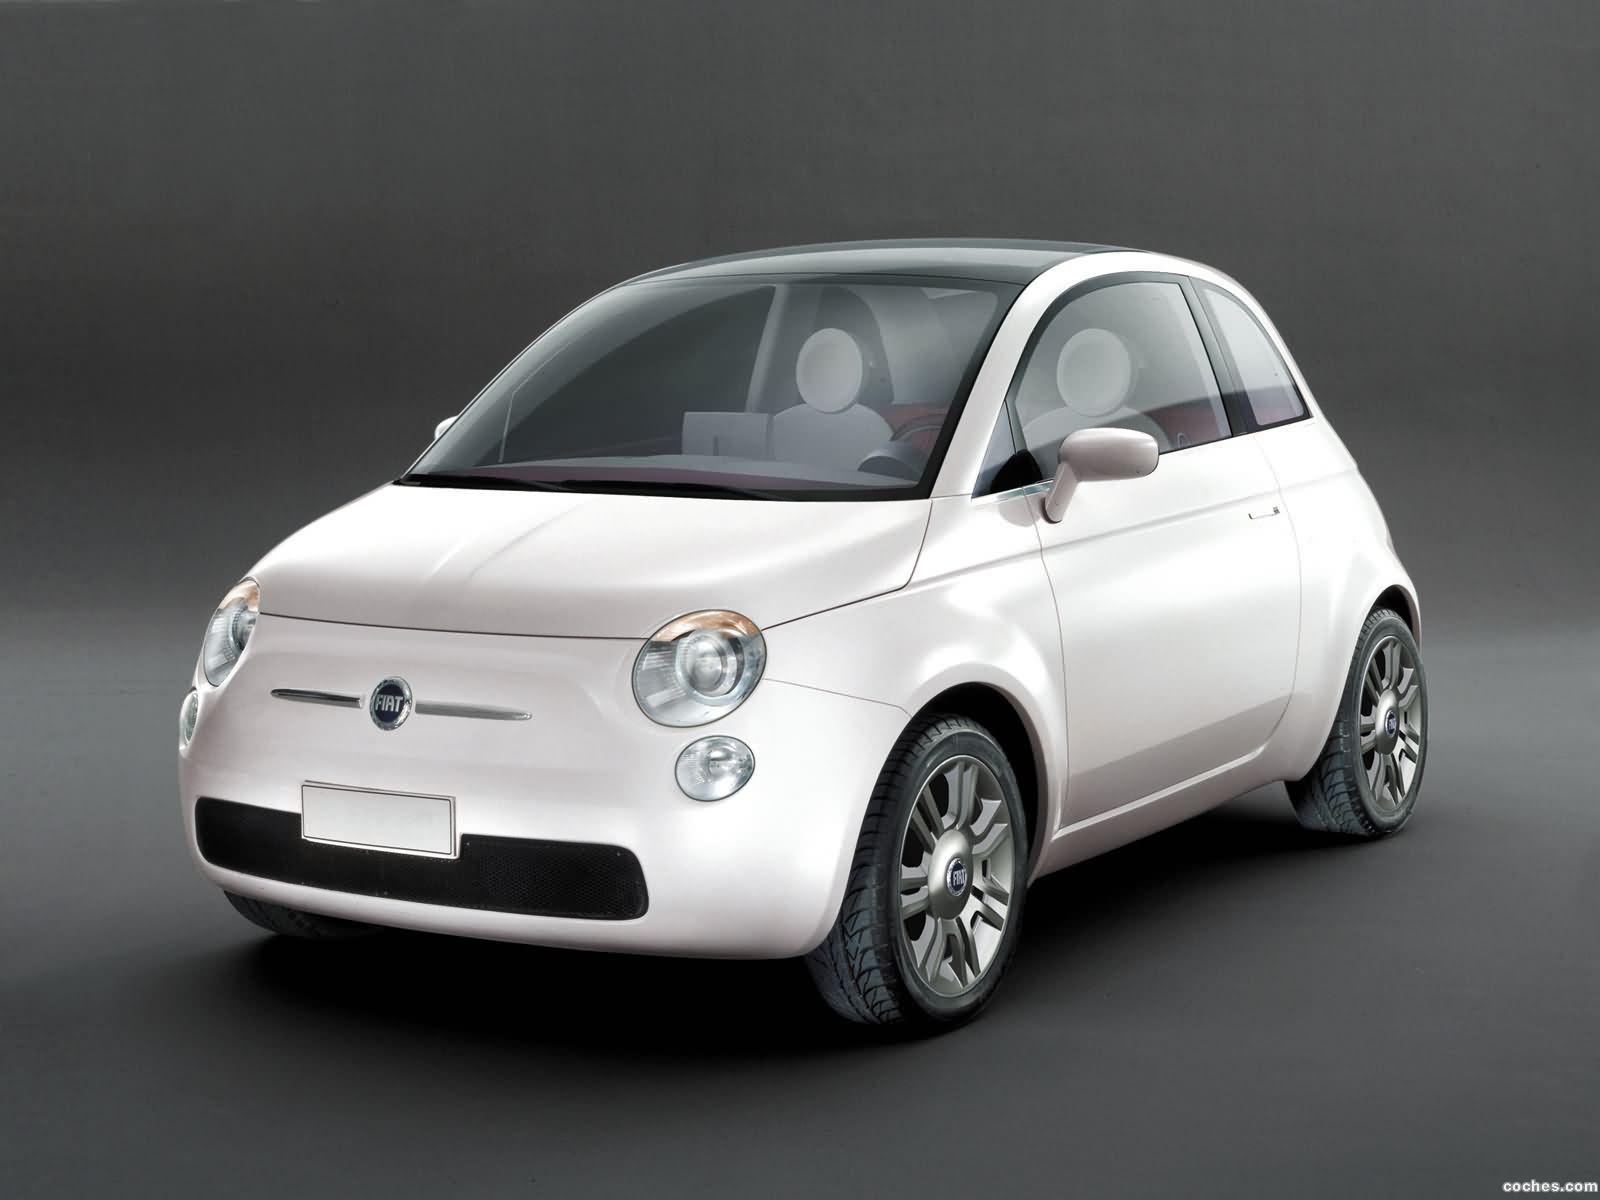 Foto 0 de Fiat Trepiuno Concept 2004